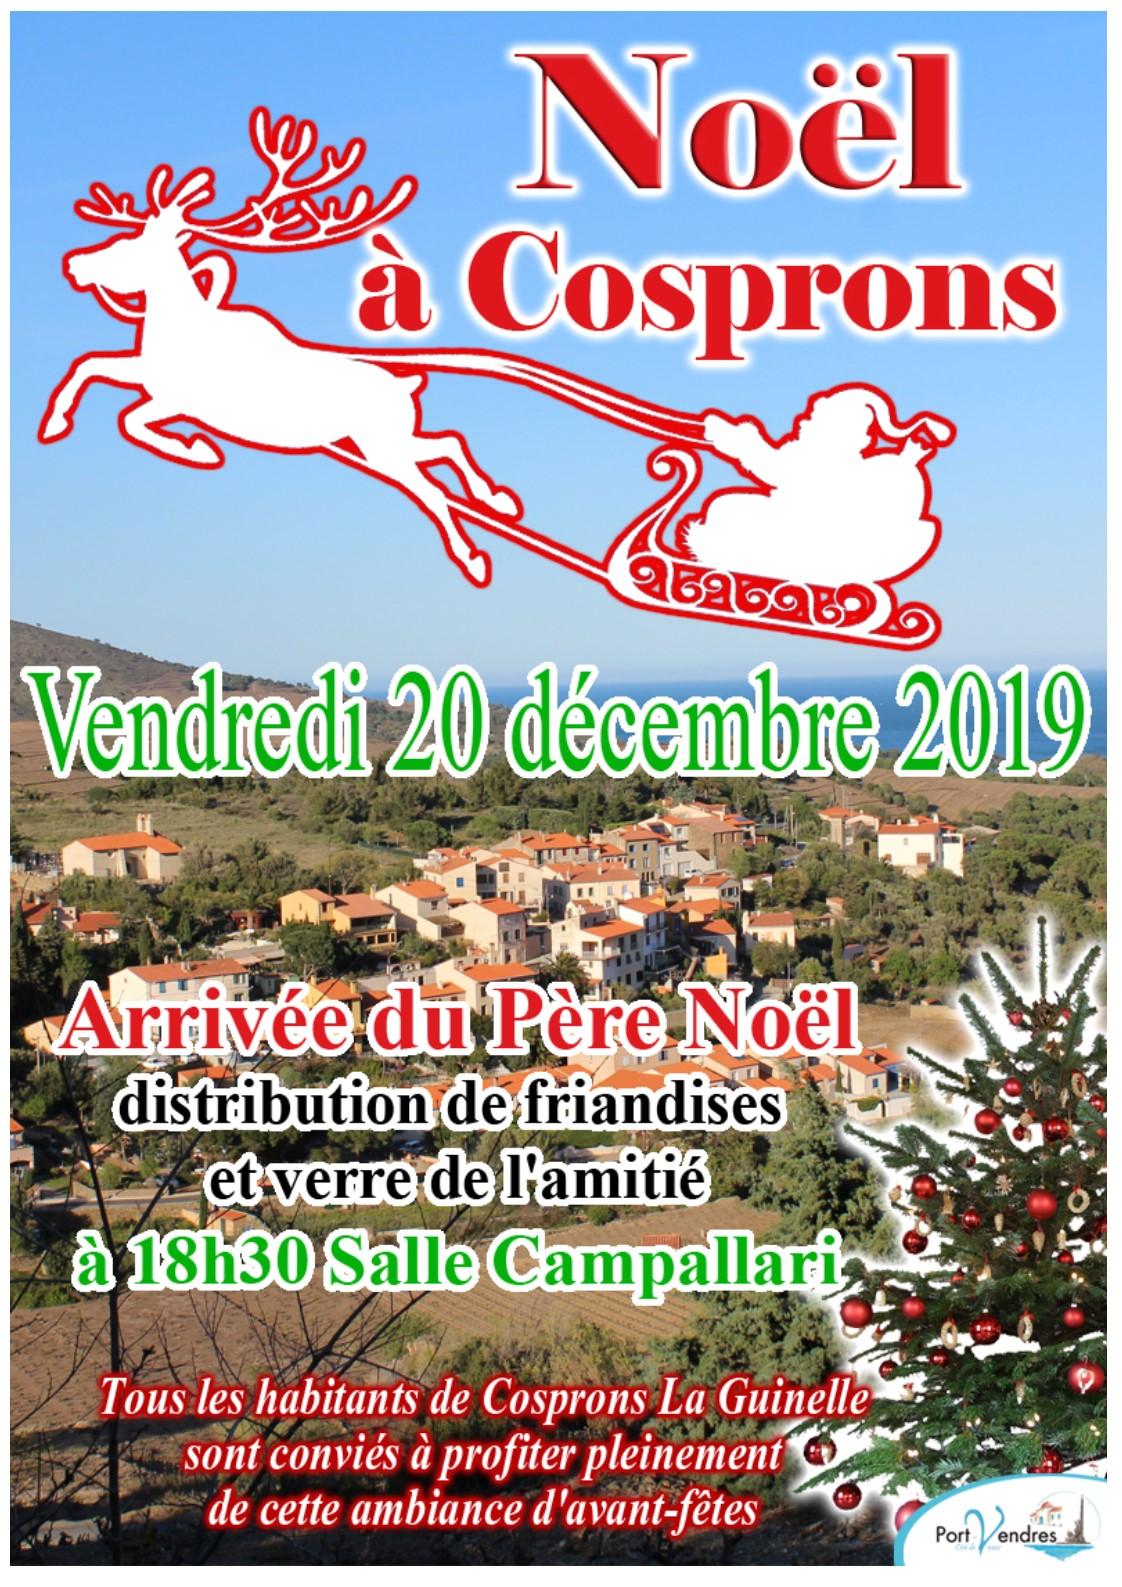 2019 Affiche Noël de Cosprons